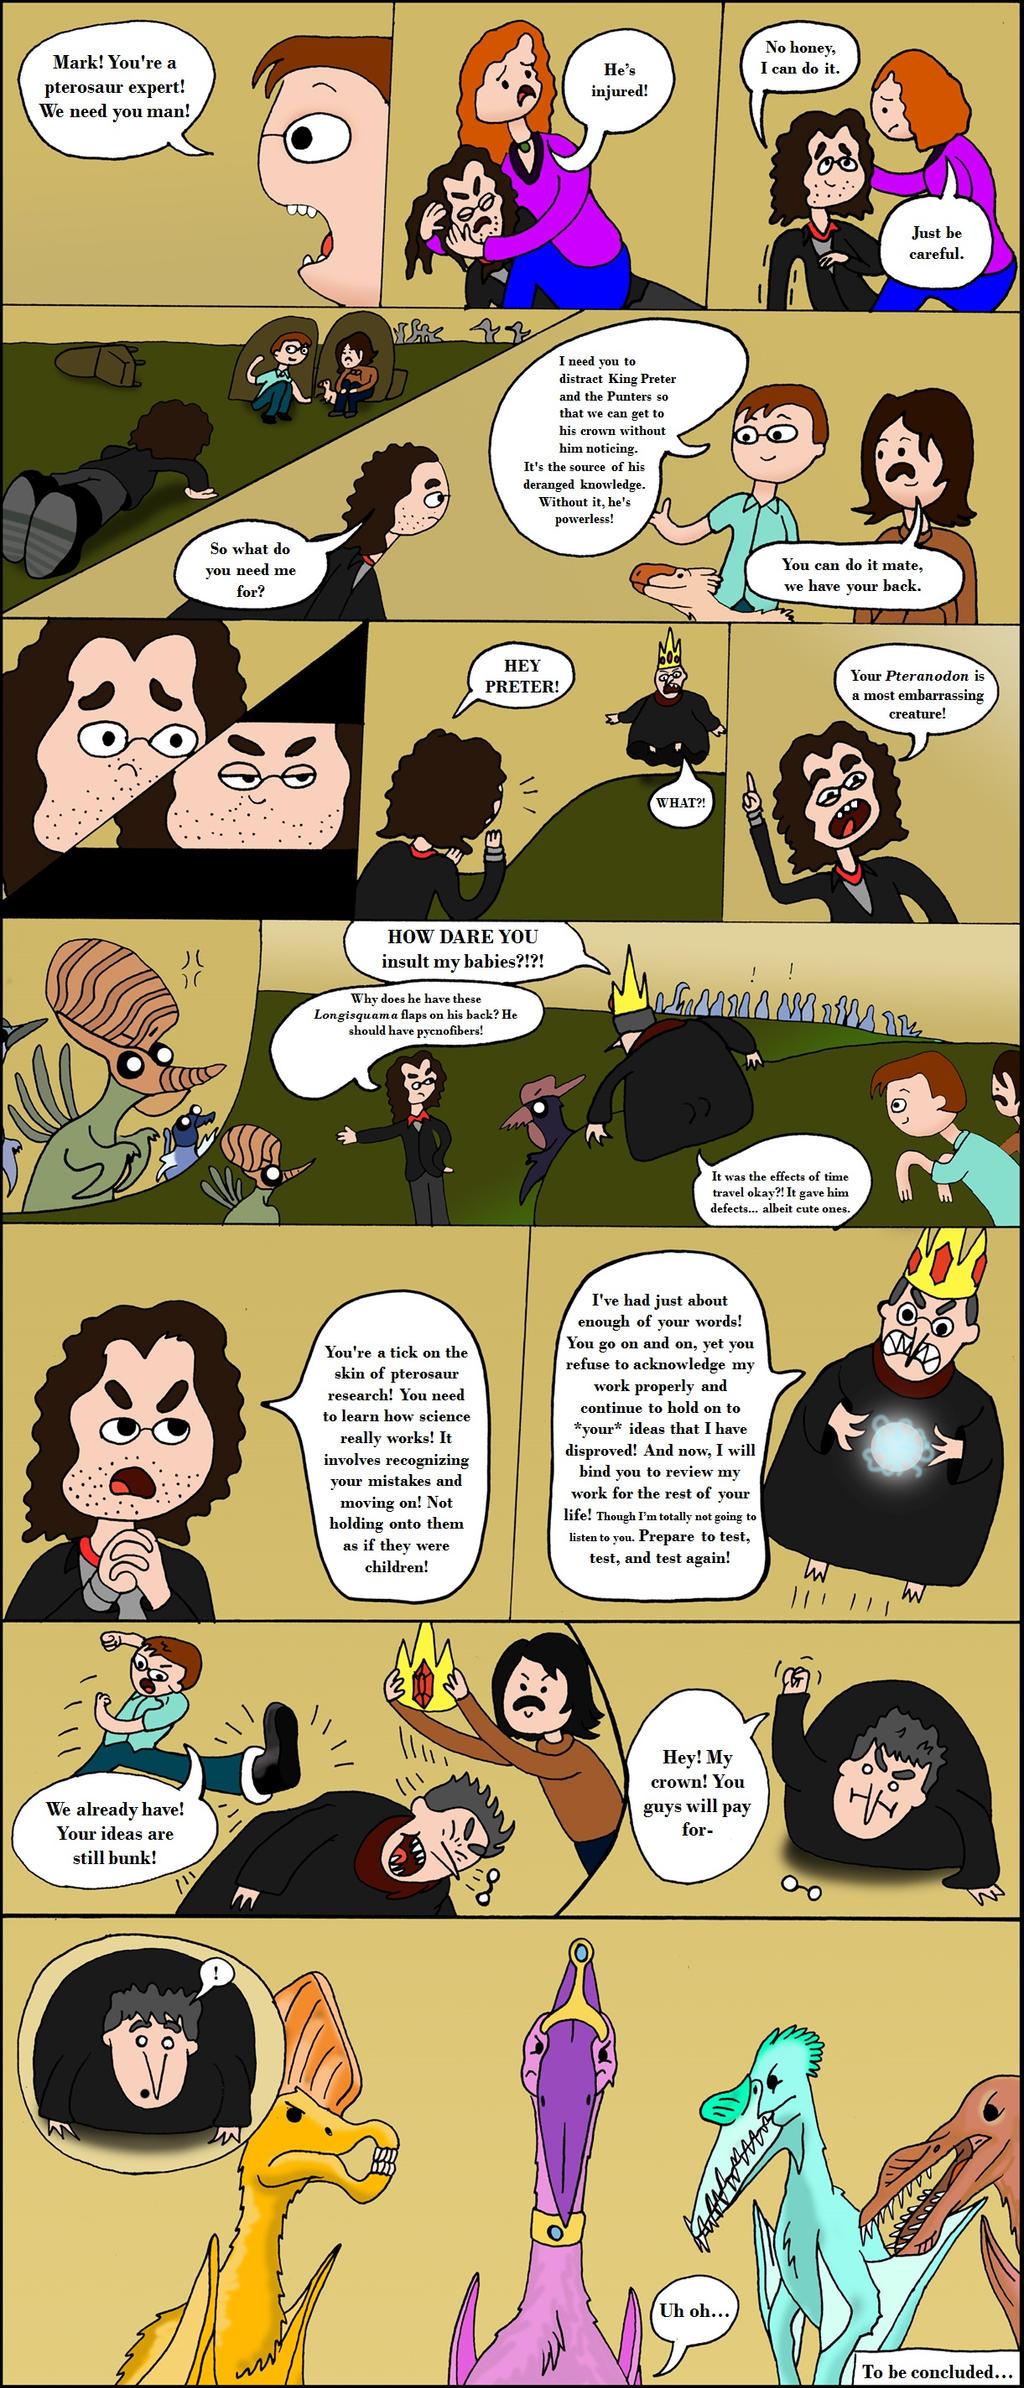 TetZoo Time! - Episode 2 (Comic 5/6) by classicalguy